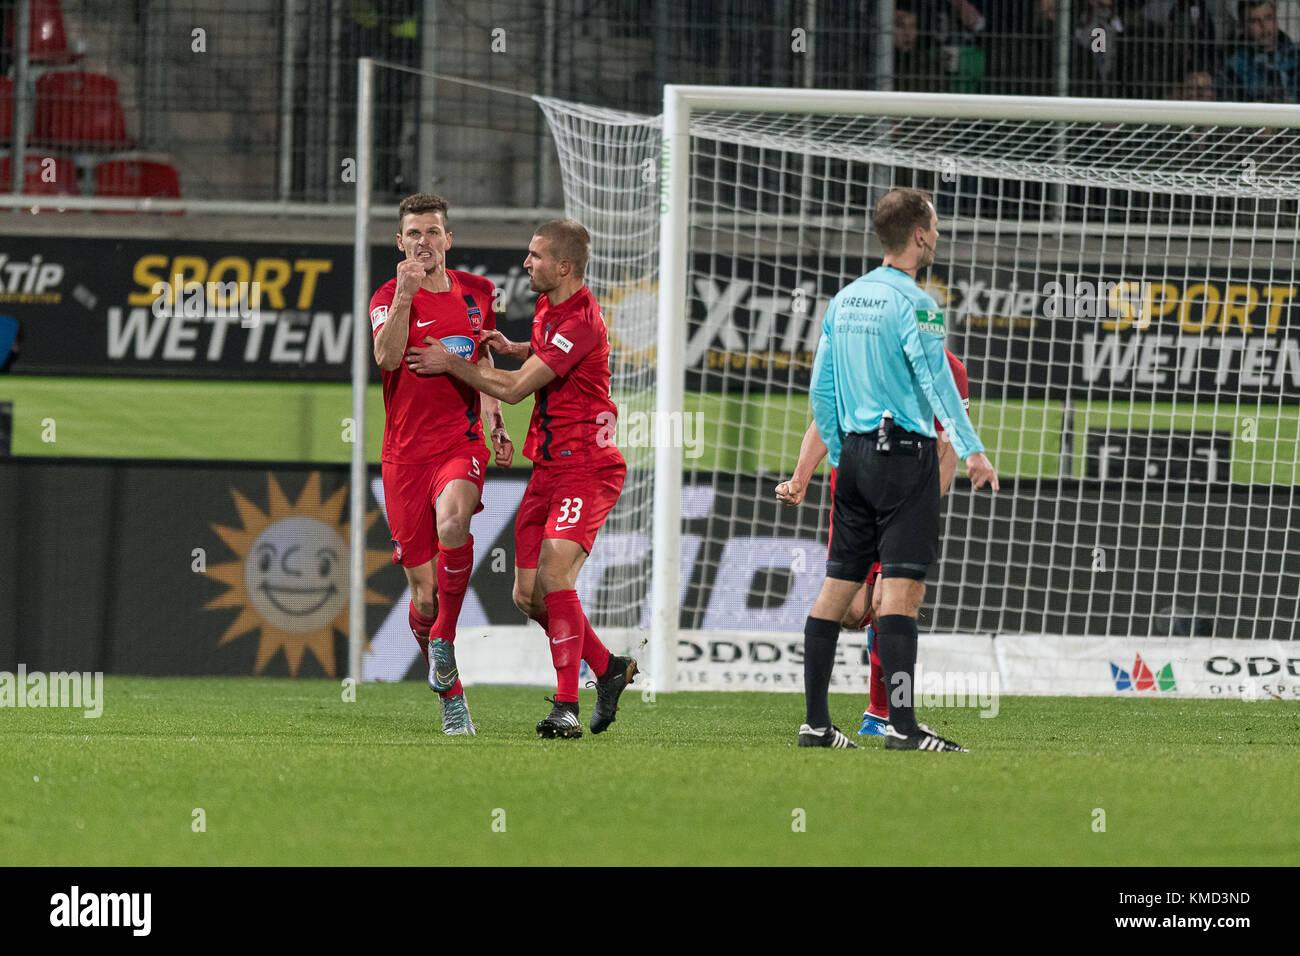 1:0 durch Mathias Wittek #05 (1. FC Heidenheim 1846),  1.FC Heidenheim 1846 vs 1.FC Kaiserslautern,  Herren, Fussball, - Stock Image